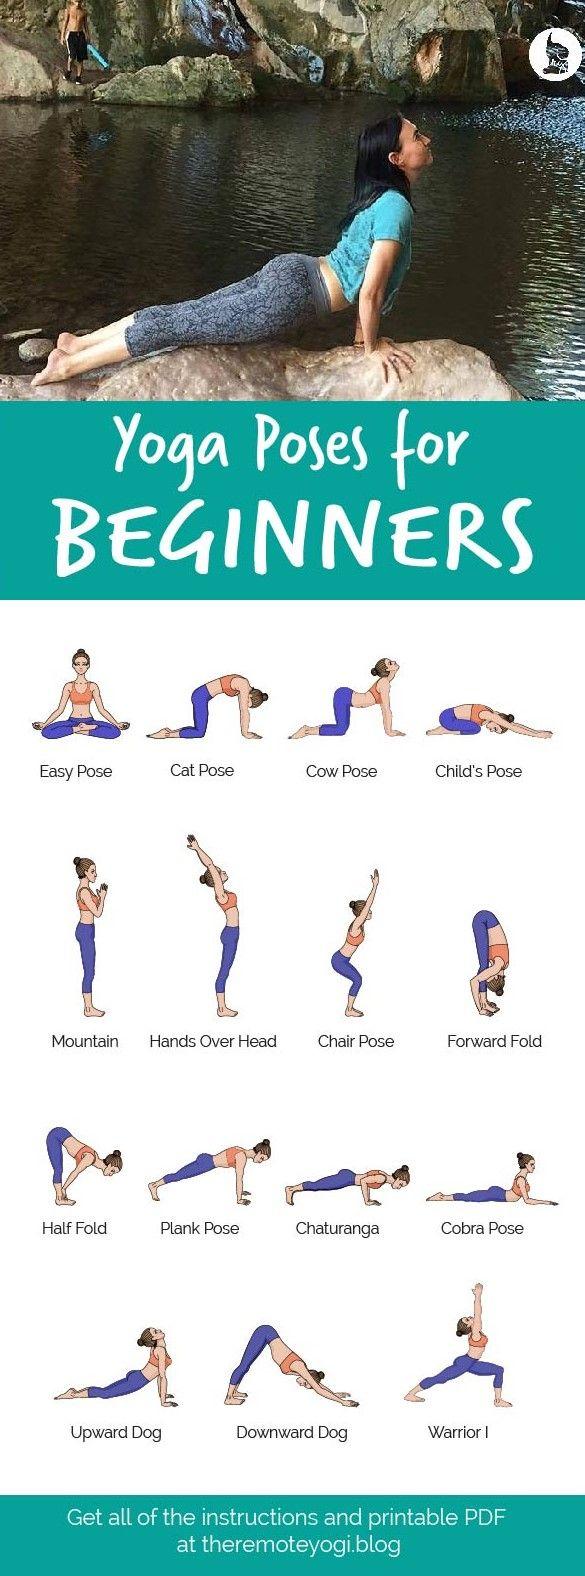 Beginner Yoga Series: Starting a Routine